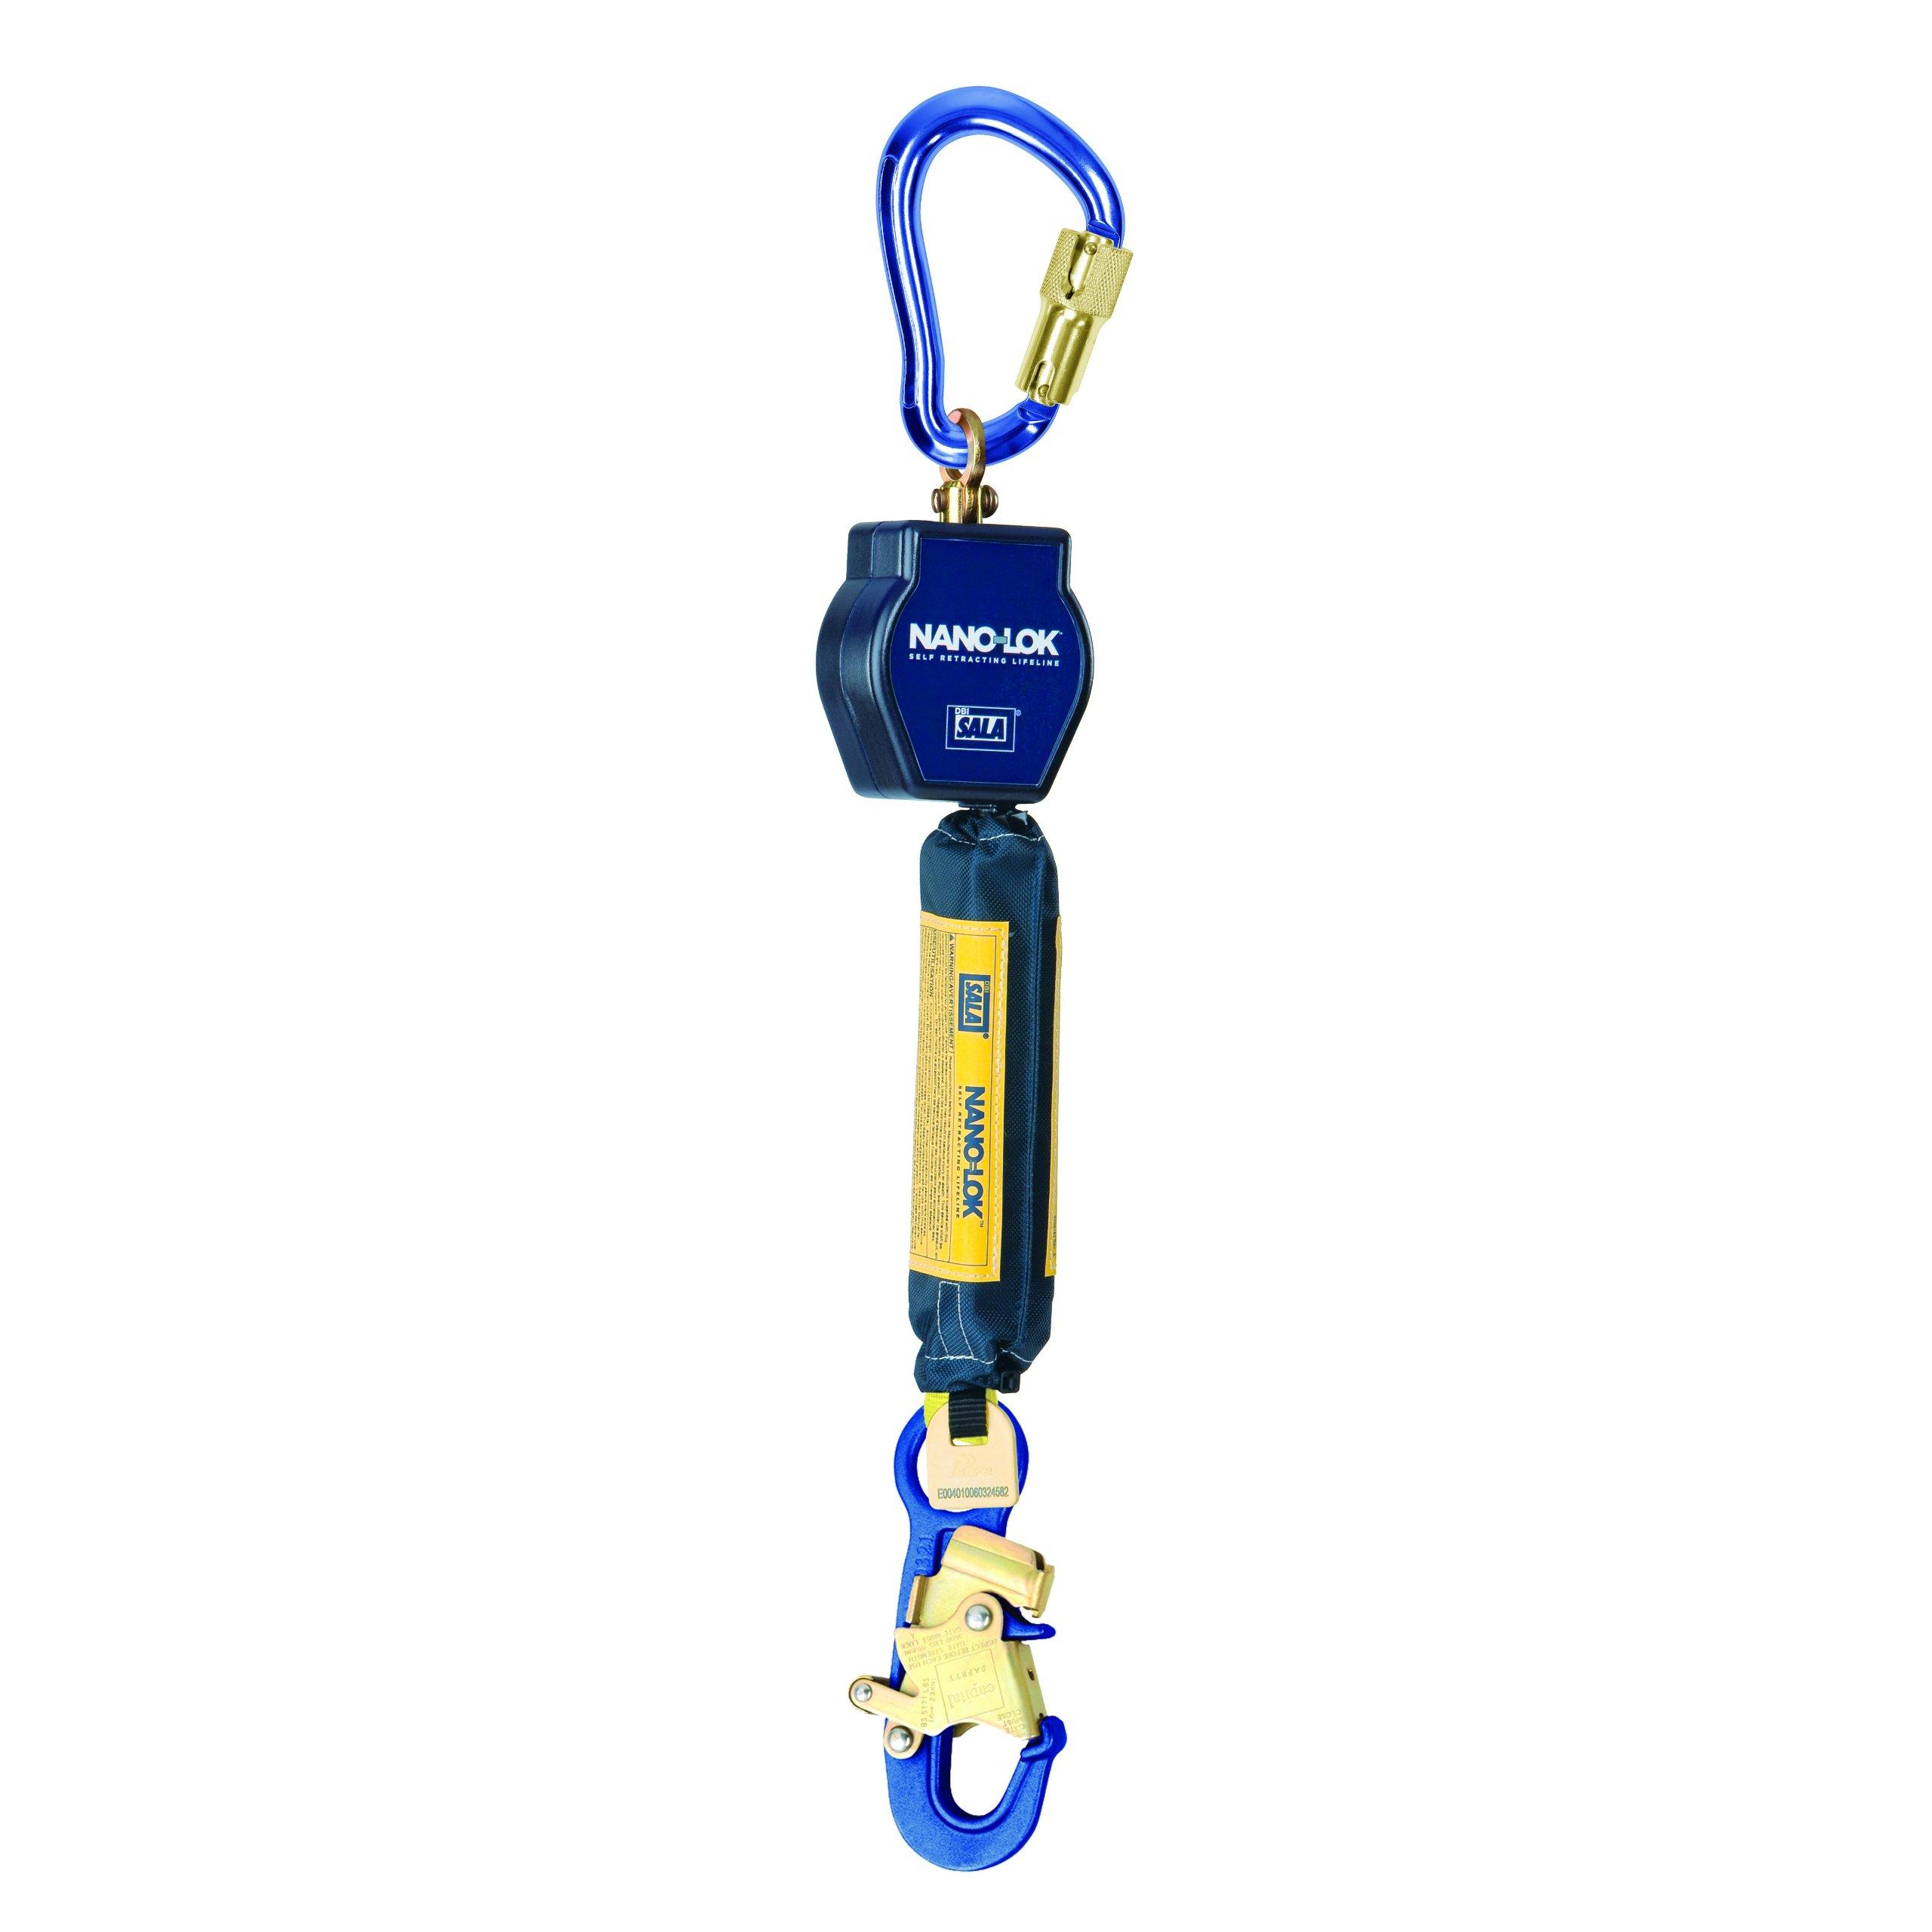 3M DBI-SALA Nano-Lok 3101214 Self Retracting Lifeline, 6', 3/4'' Dynema Polyester Web, Aluminum Snap Hook, Swiveling Anchor Loop with Aluminum Carabiner, Blue